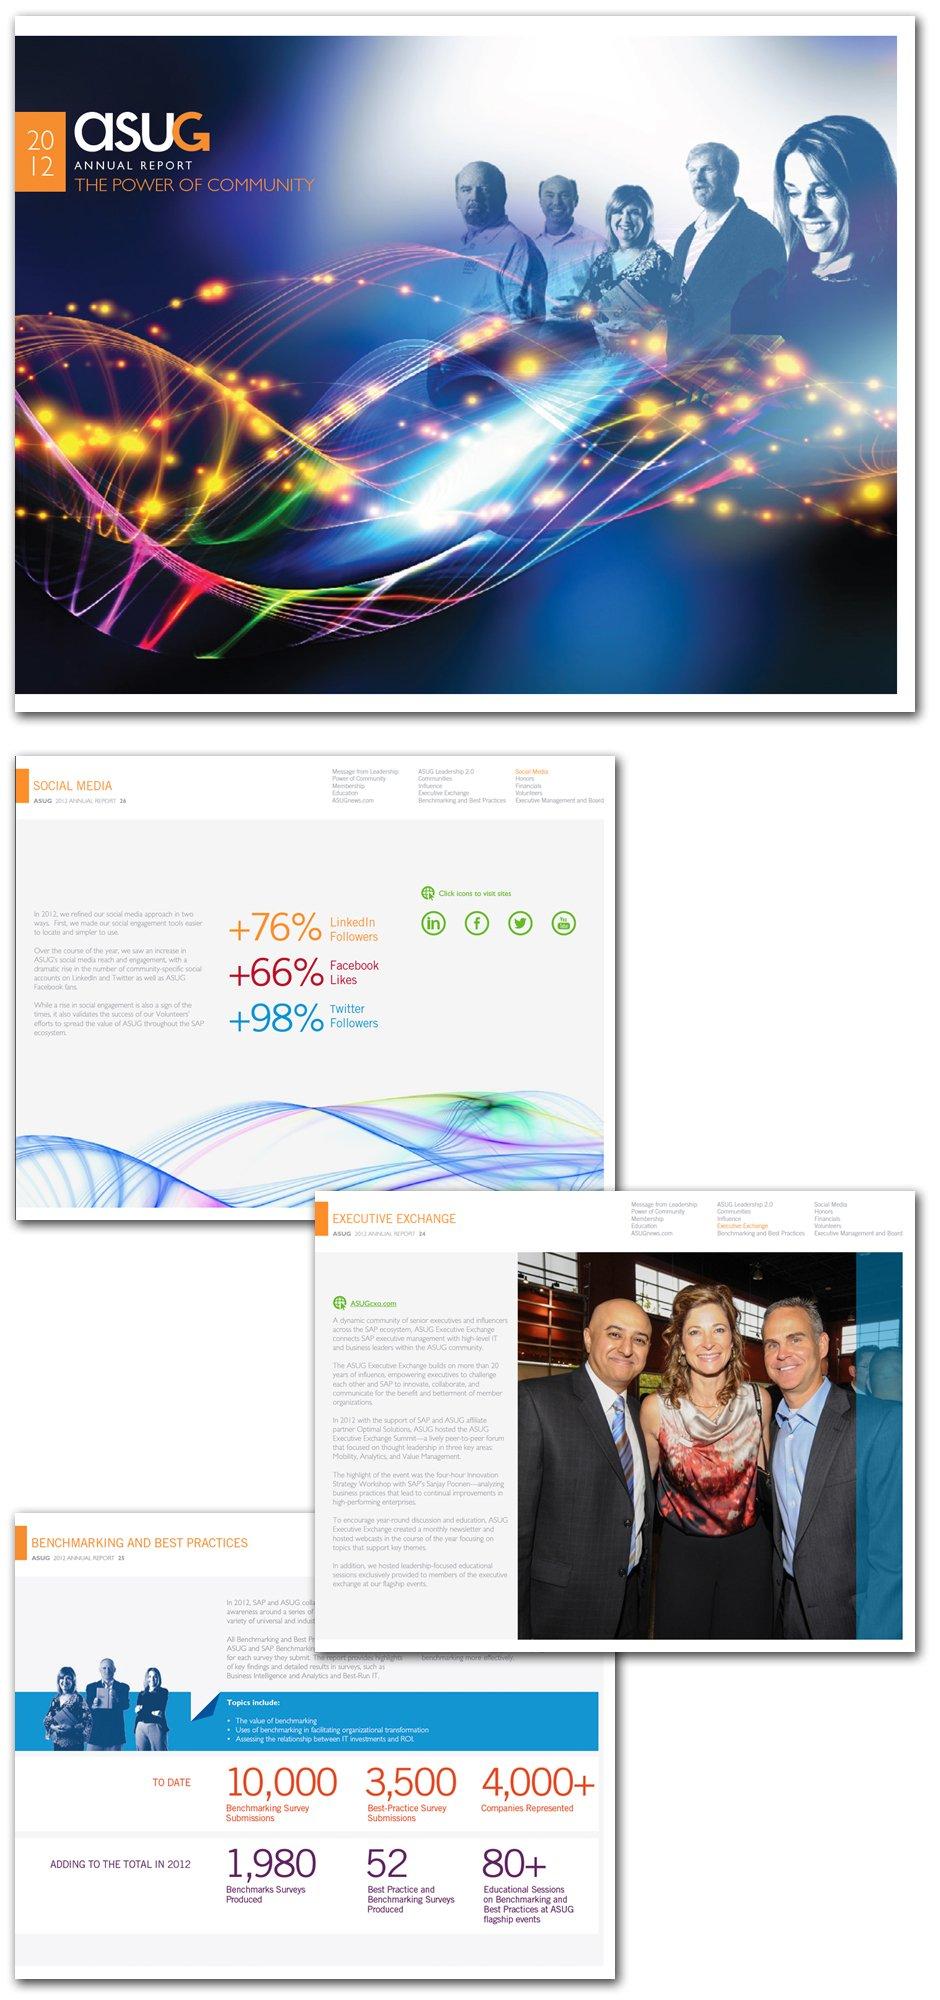 ASUG 2012 annual report